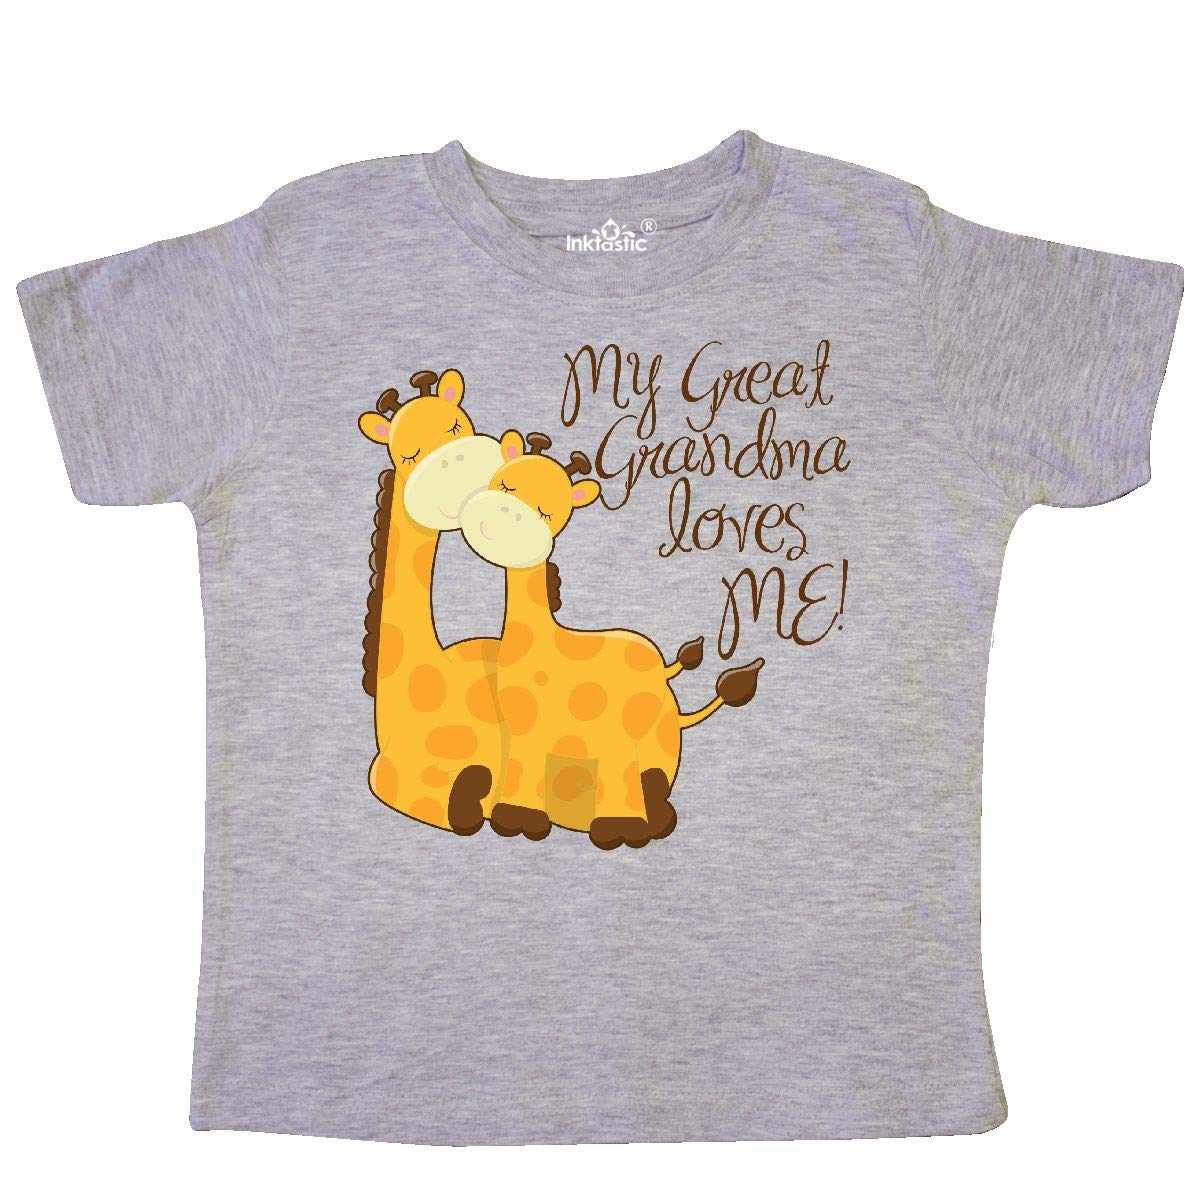 inktastic My Great Grandma Loves Me Toddler T-Shirt